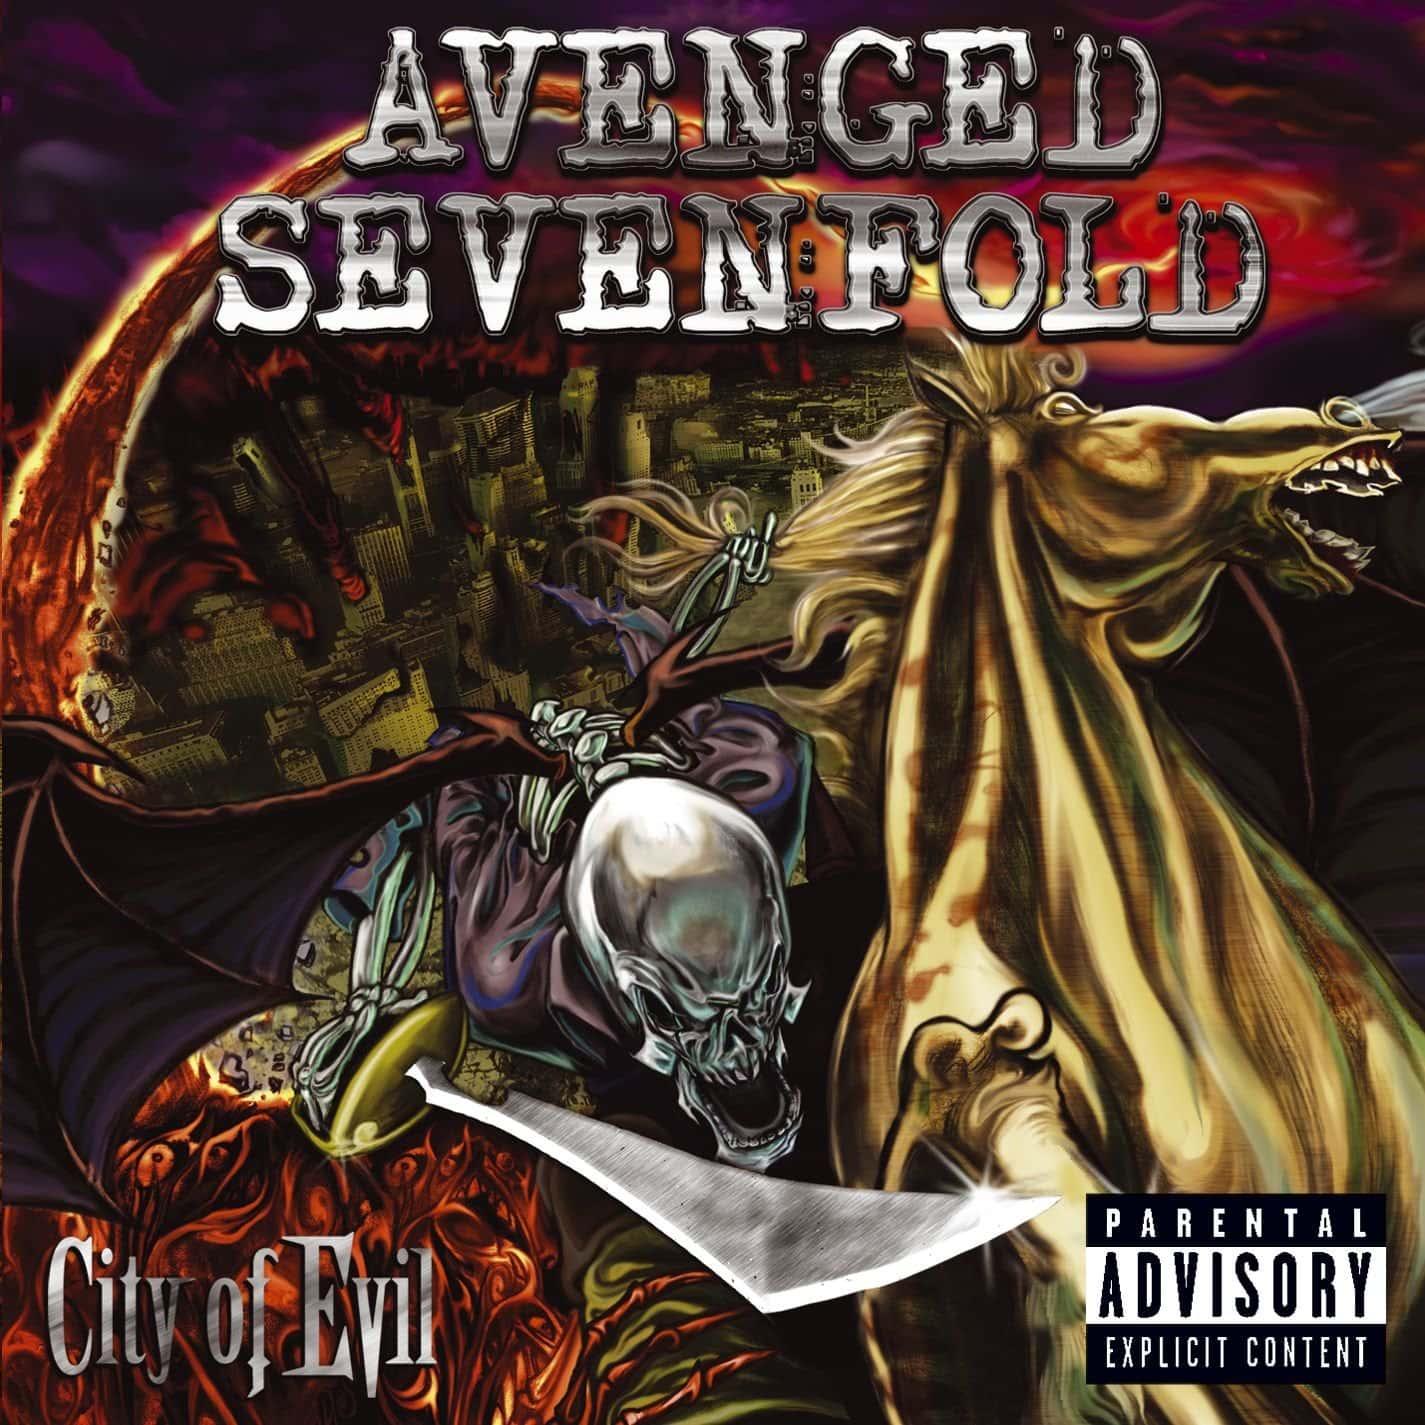 Avenged Sevenfold City Of Evil 2005